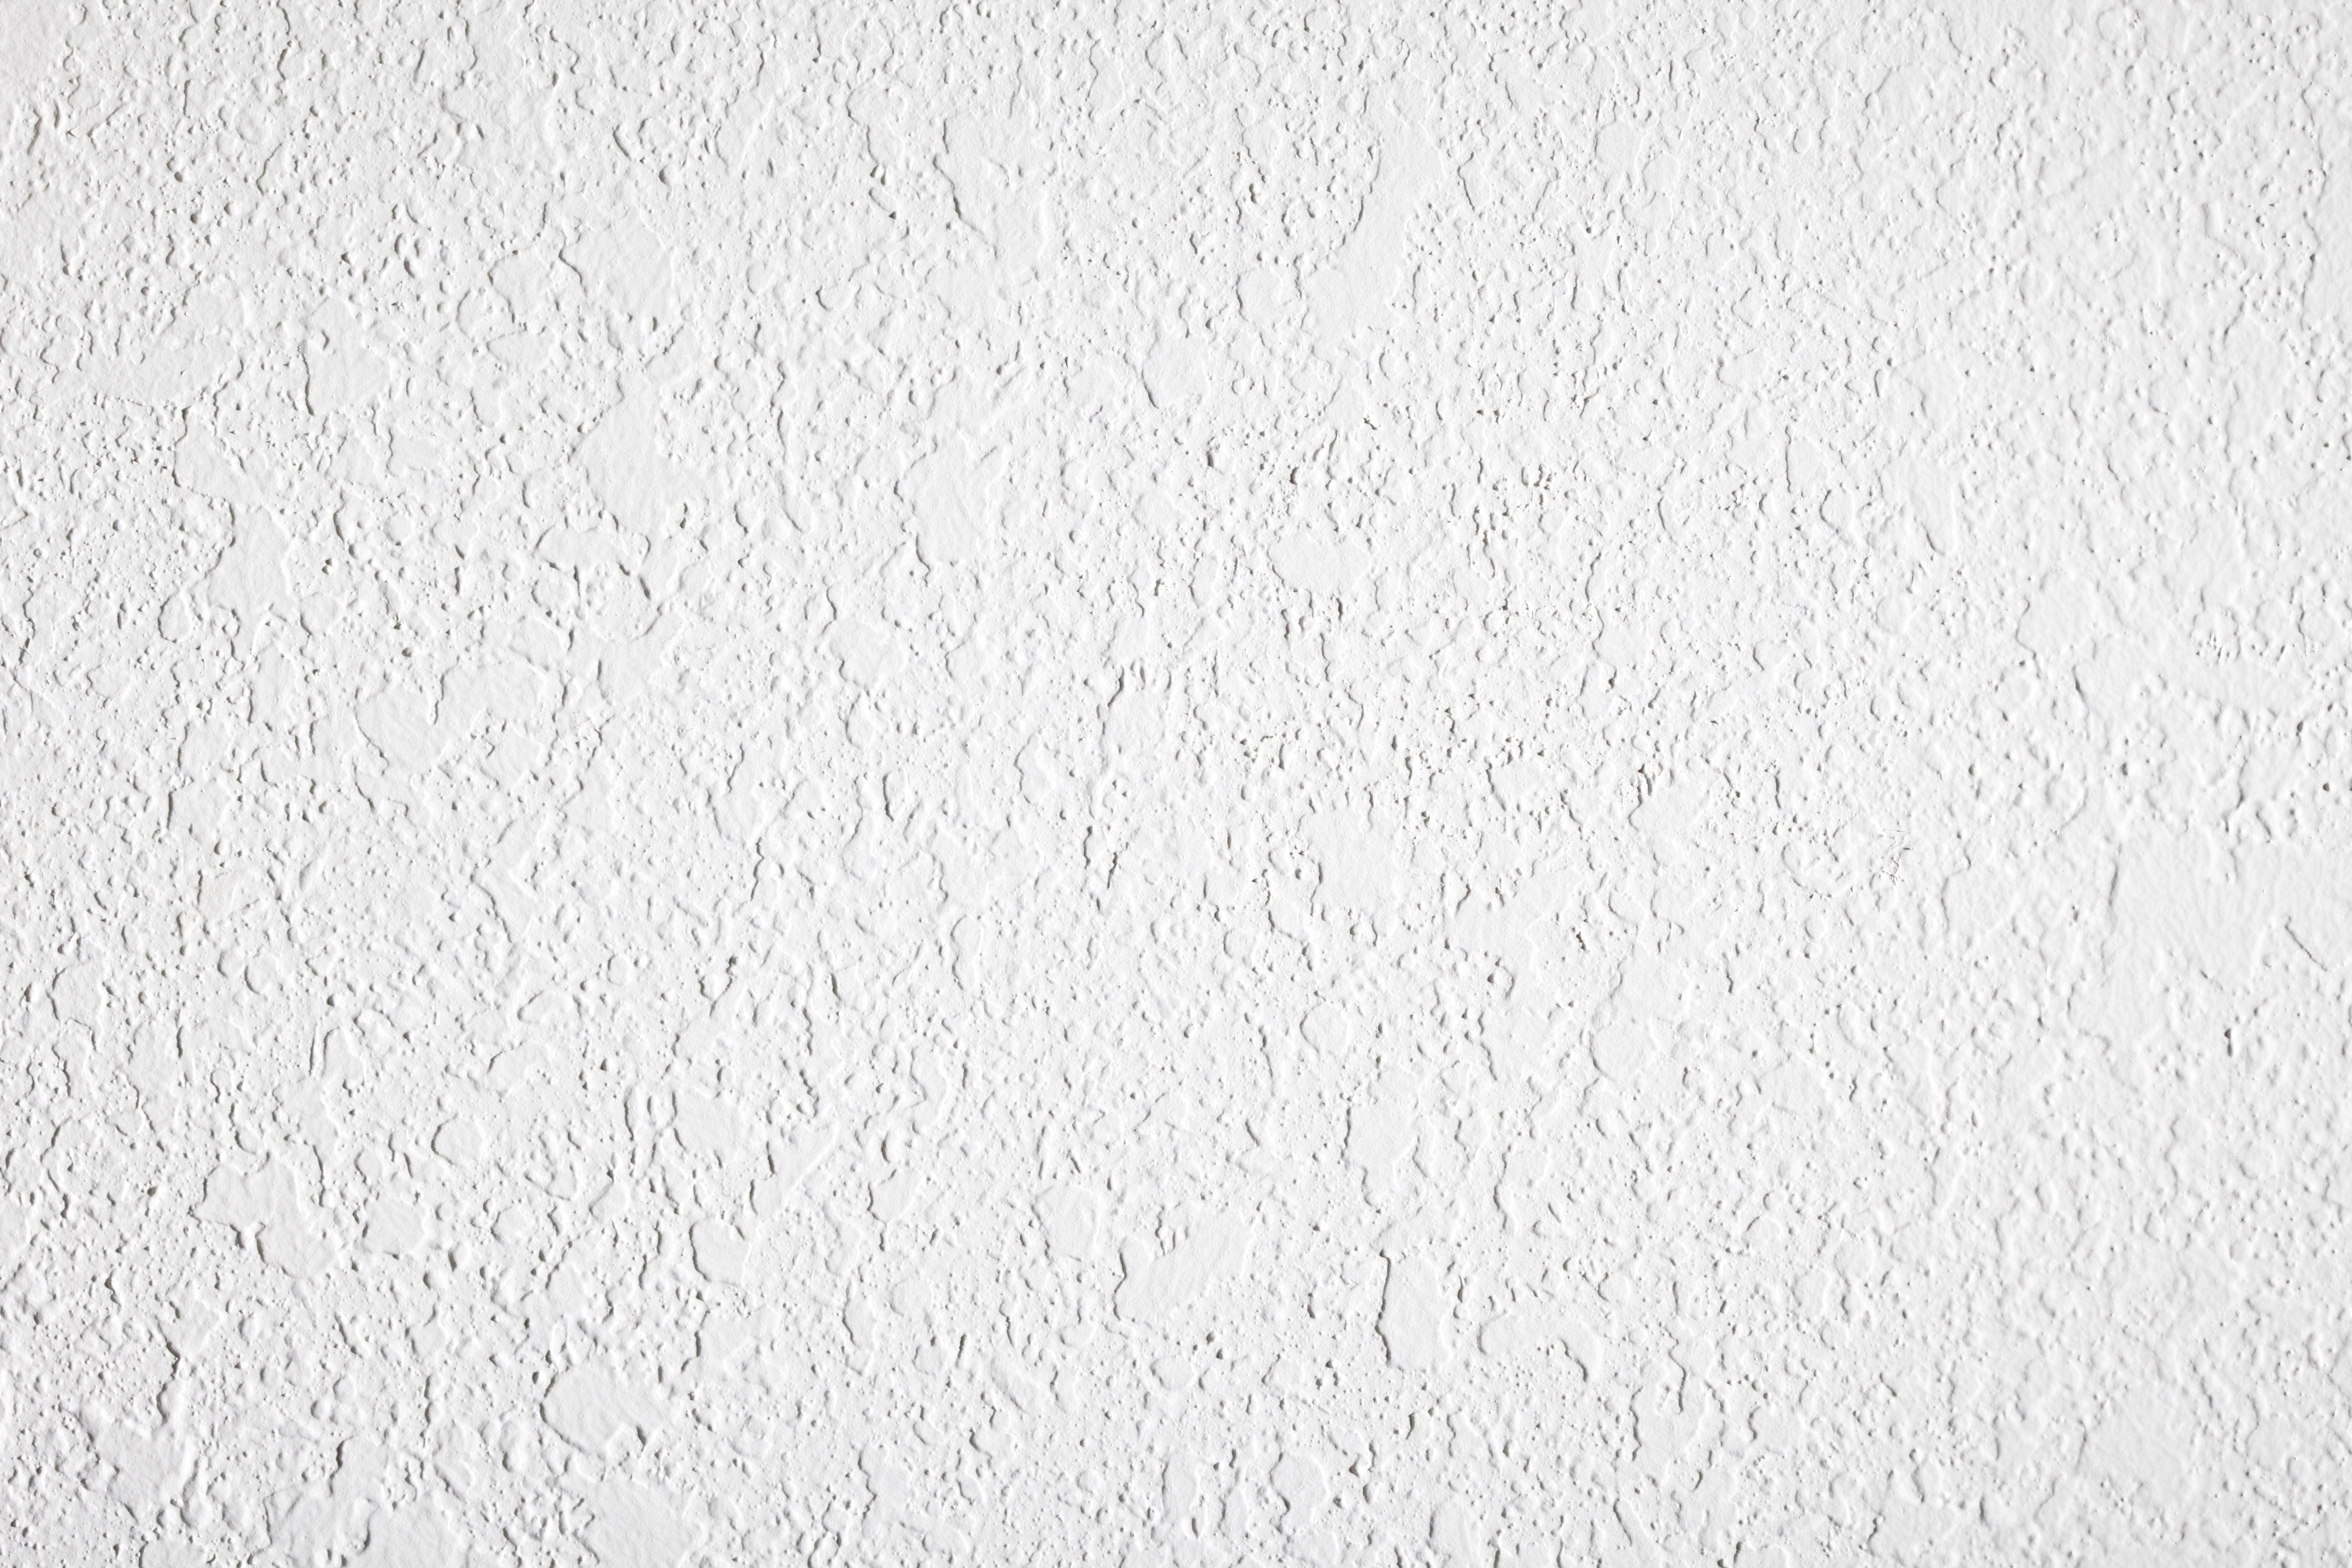 You Can Repair Orange-Peel Texture on Walls in 2019